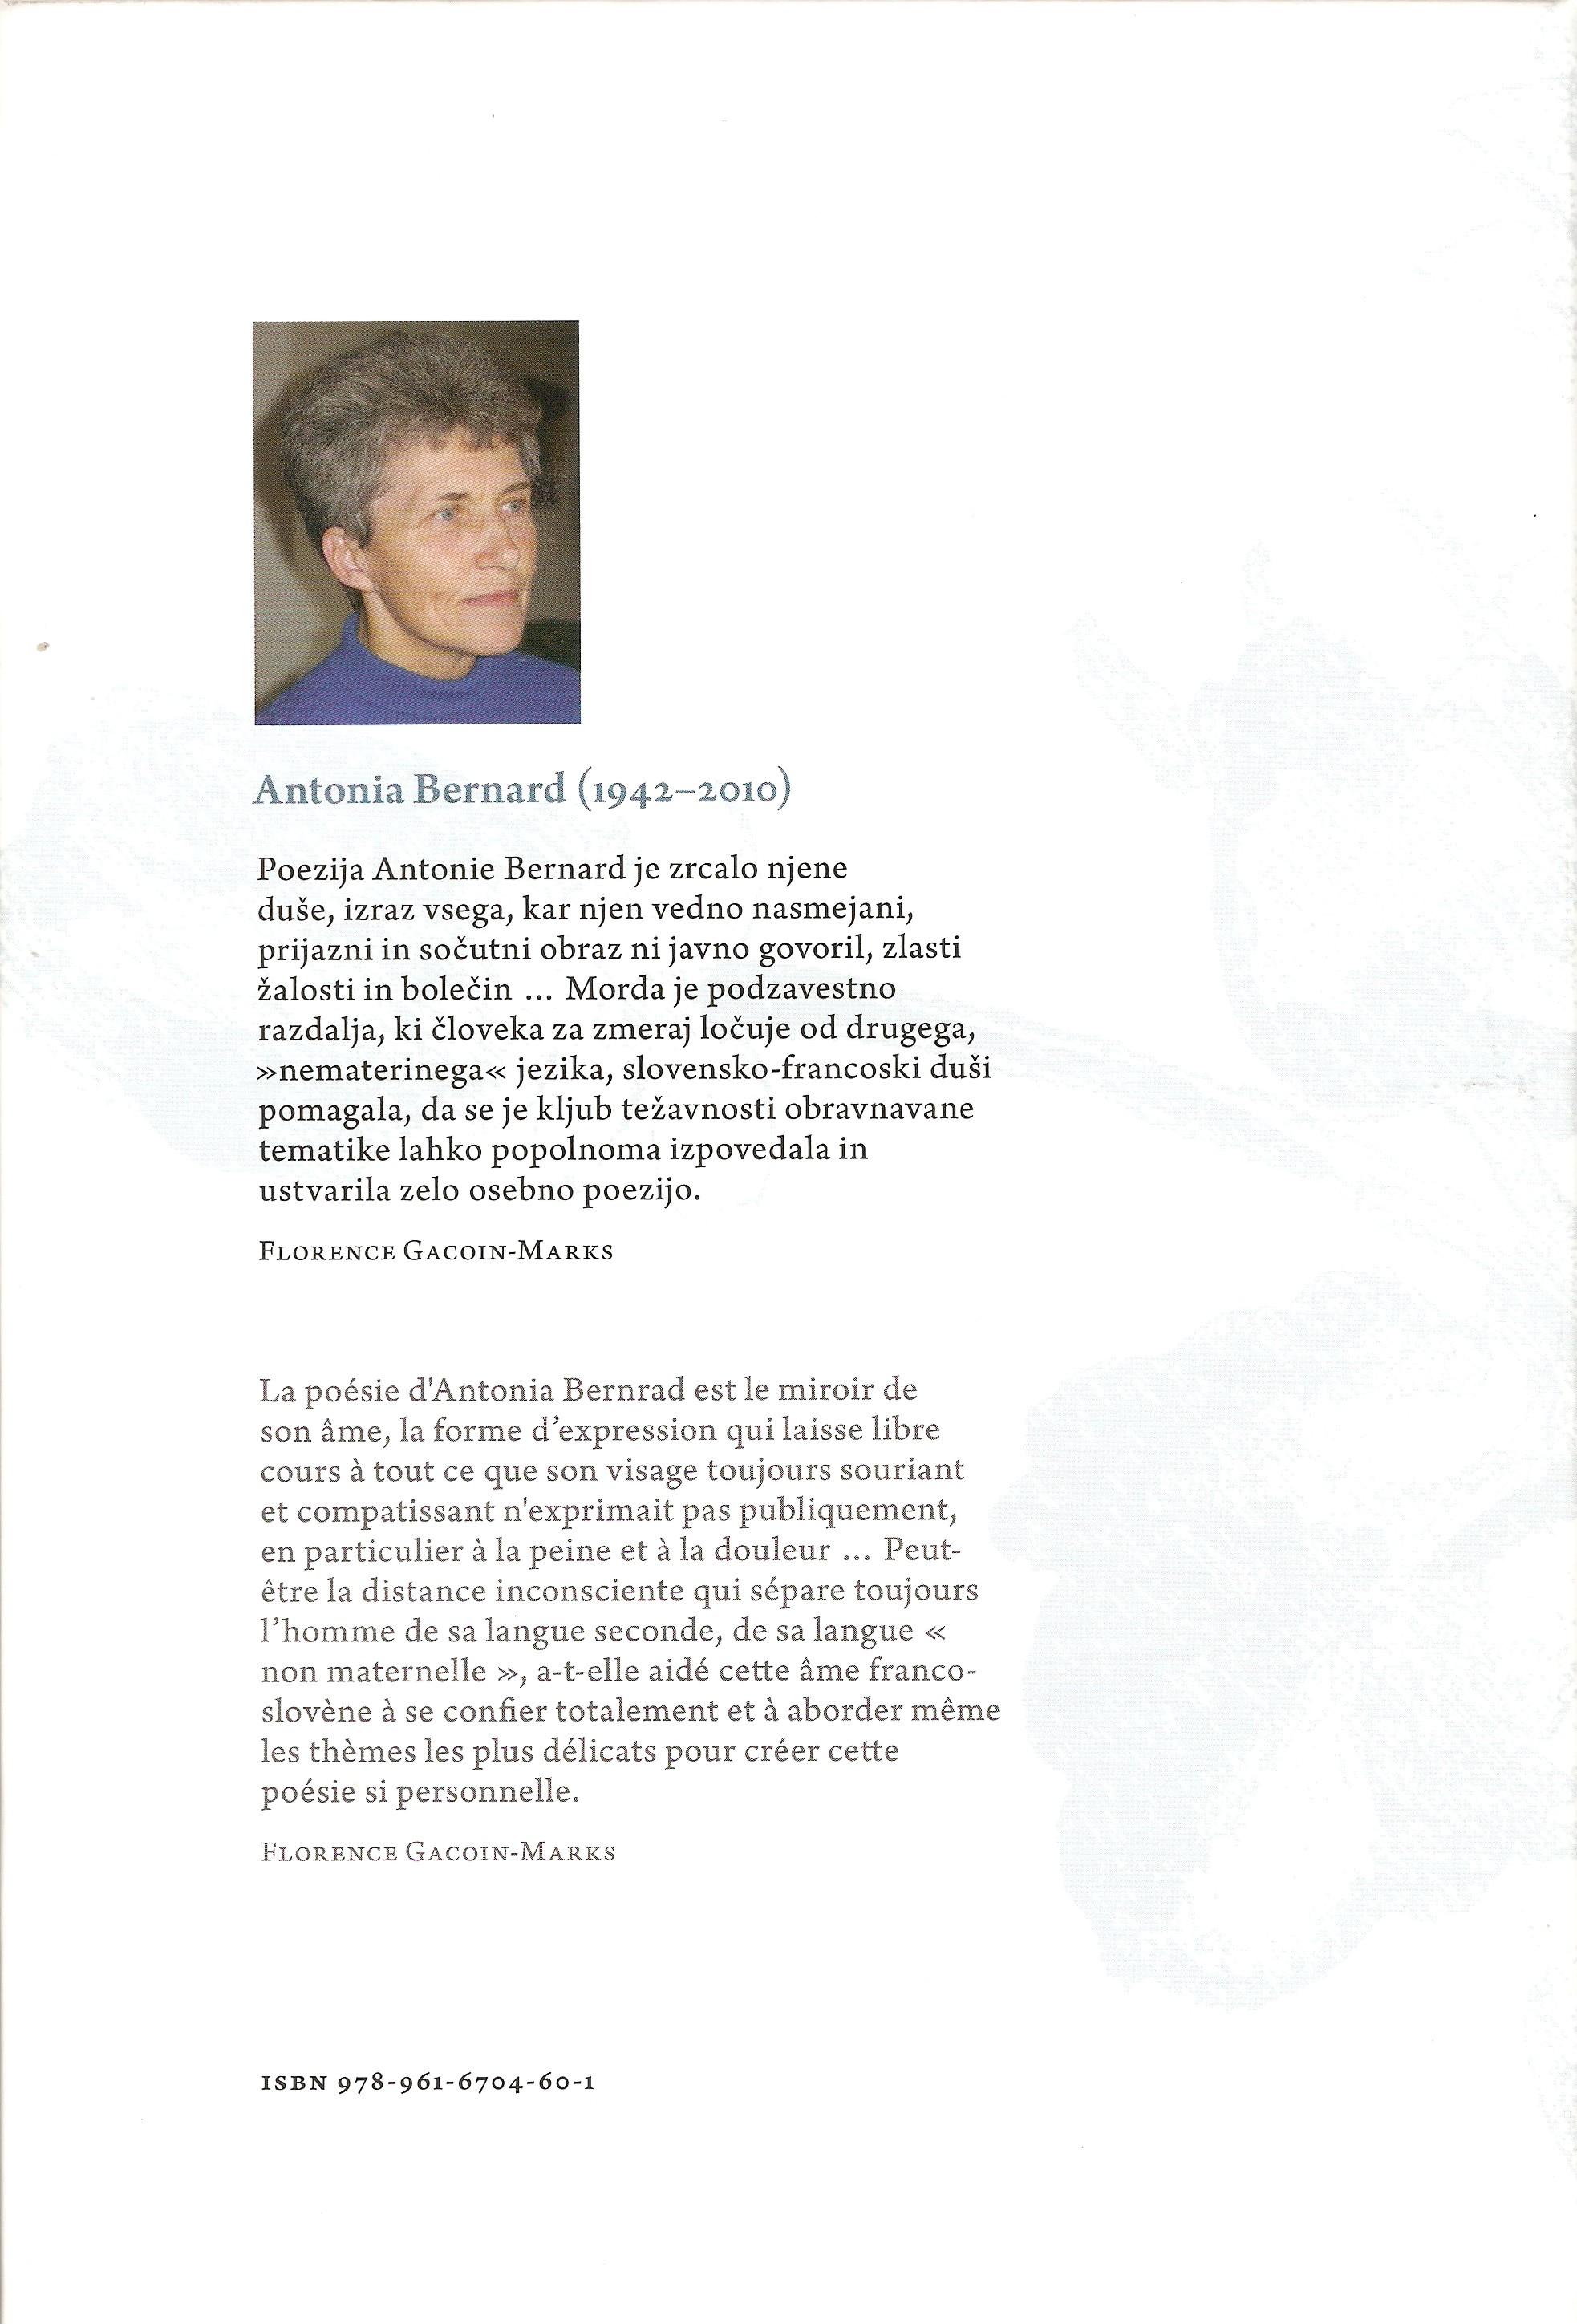 http://shramba.lovrenc.net/zomaster/klepet/hrbtna-stran-knjige.jpg